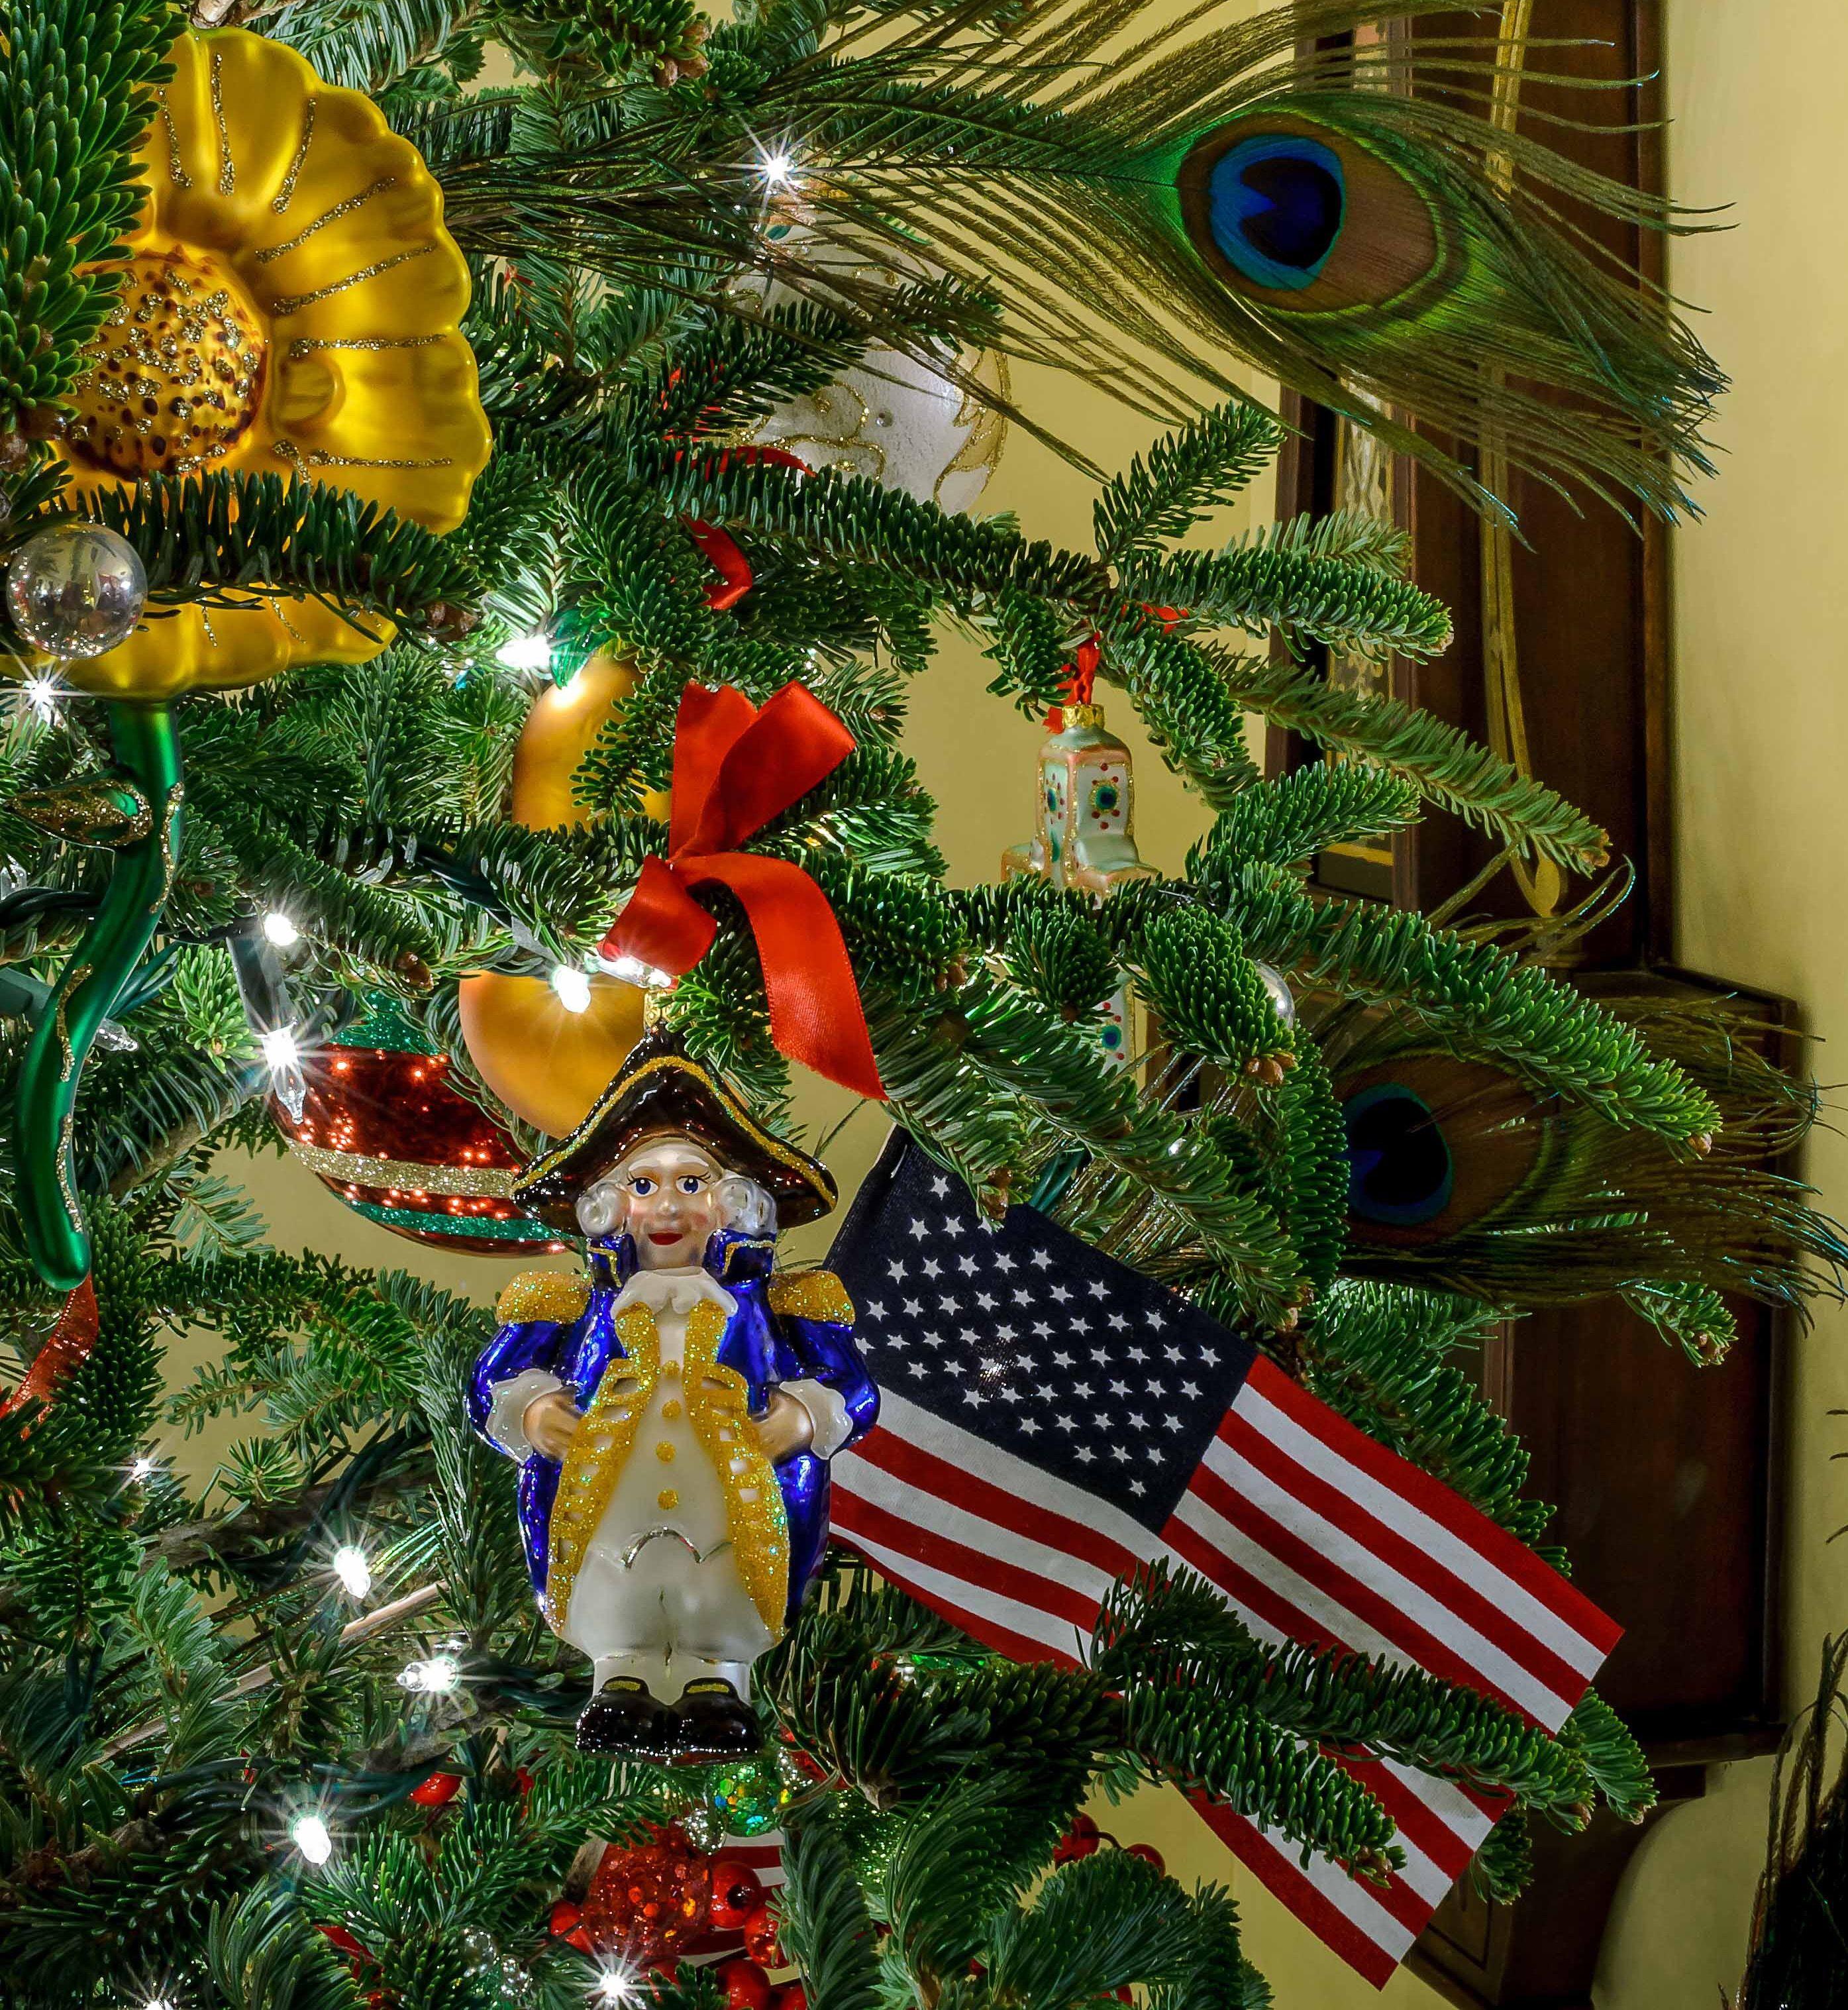 A Christmas Tree That Celebrates America Patriotic Christmas Tree Patriotic Christmas Christmas Tree